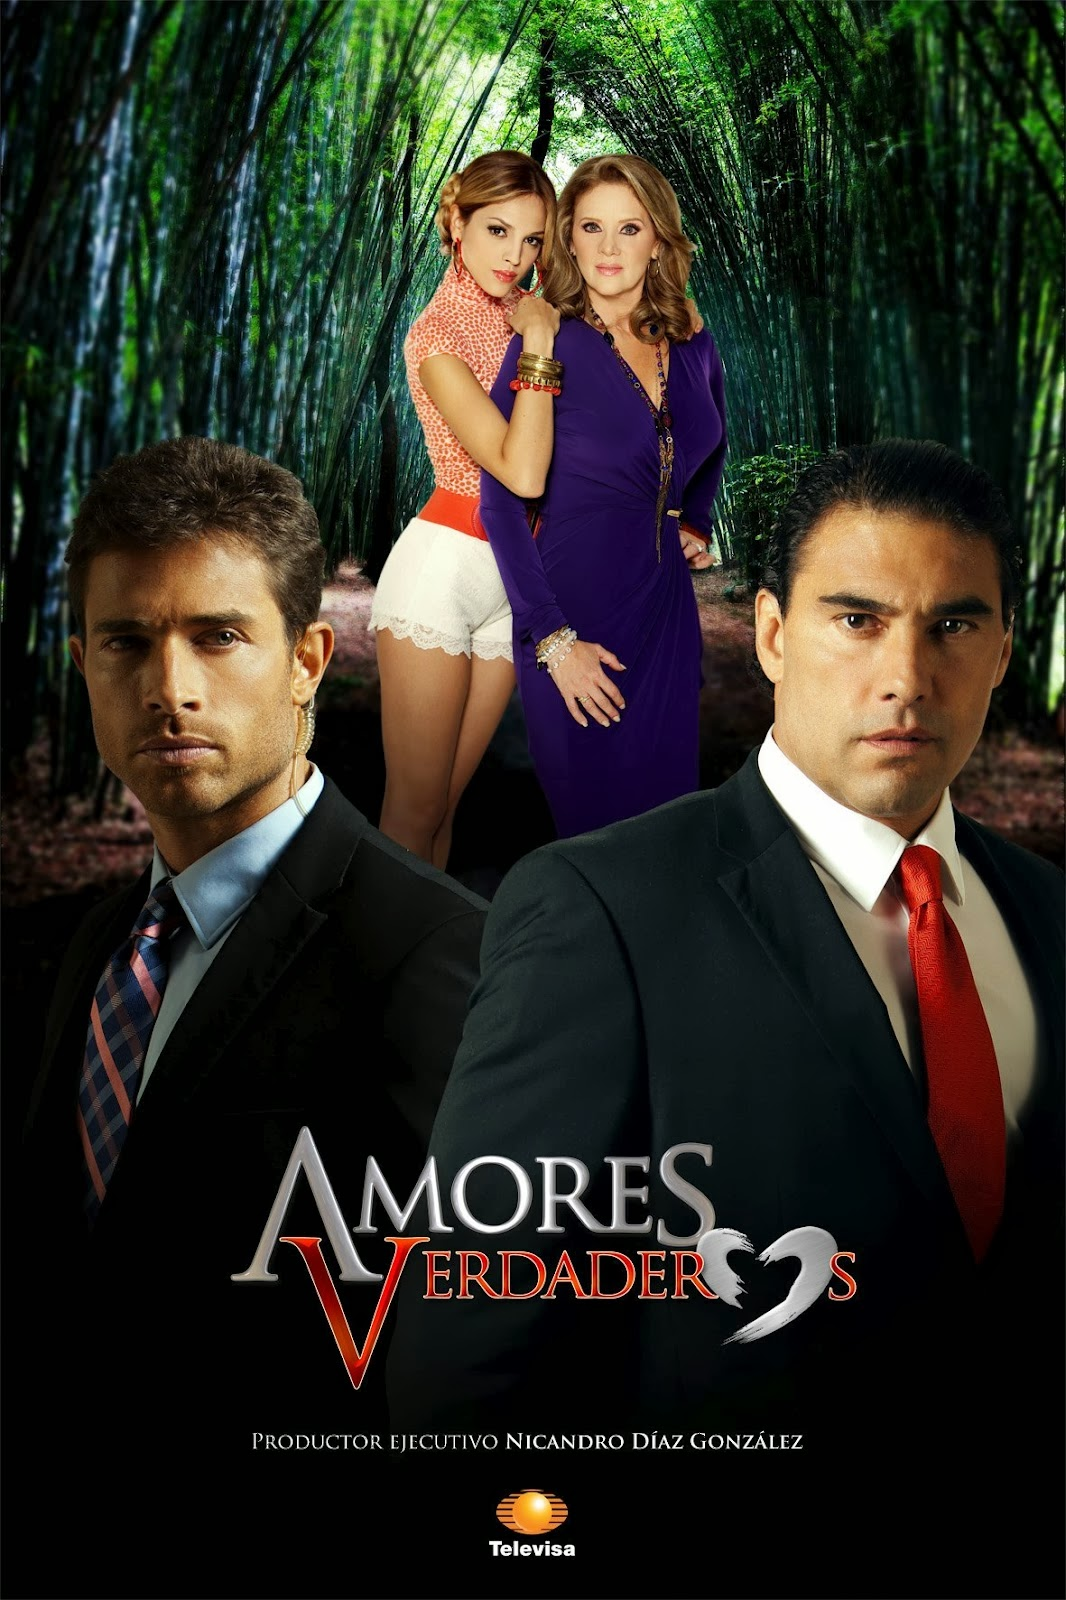 Transmitida por Univision